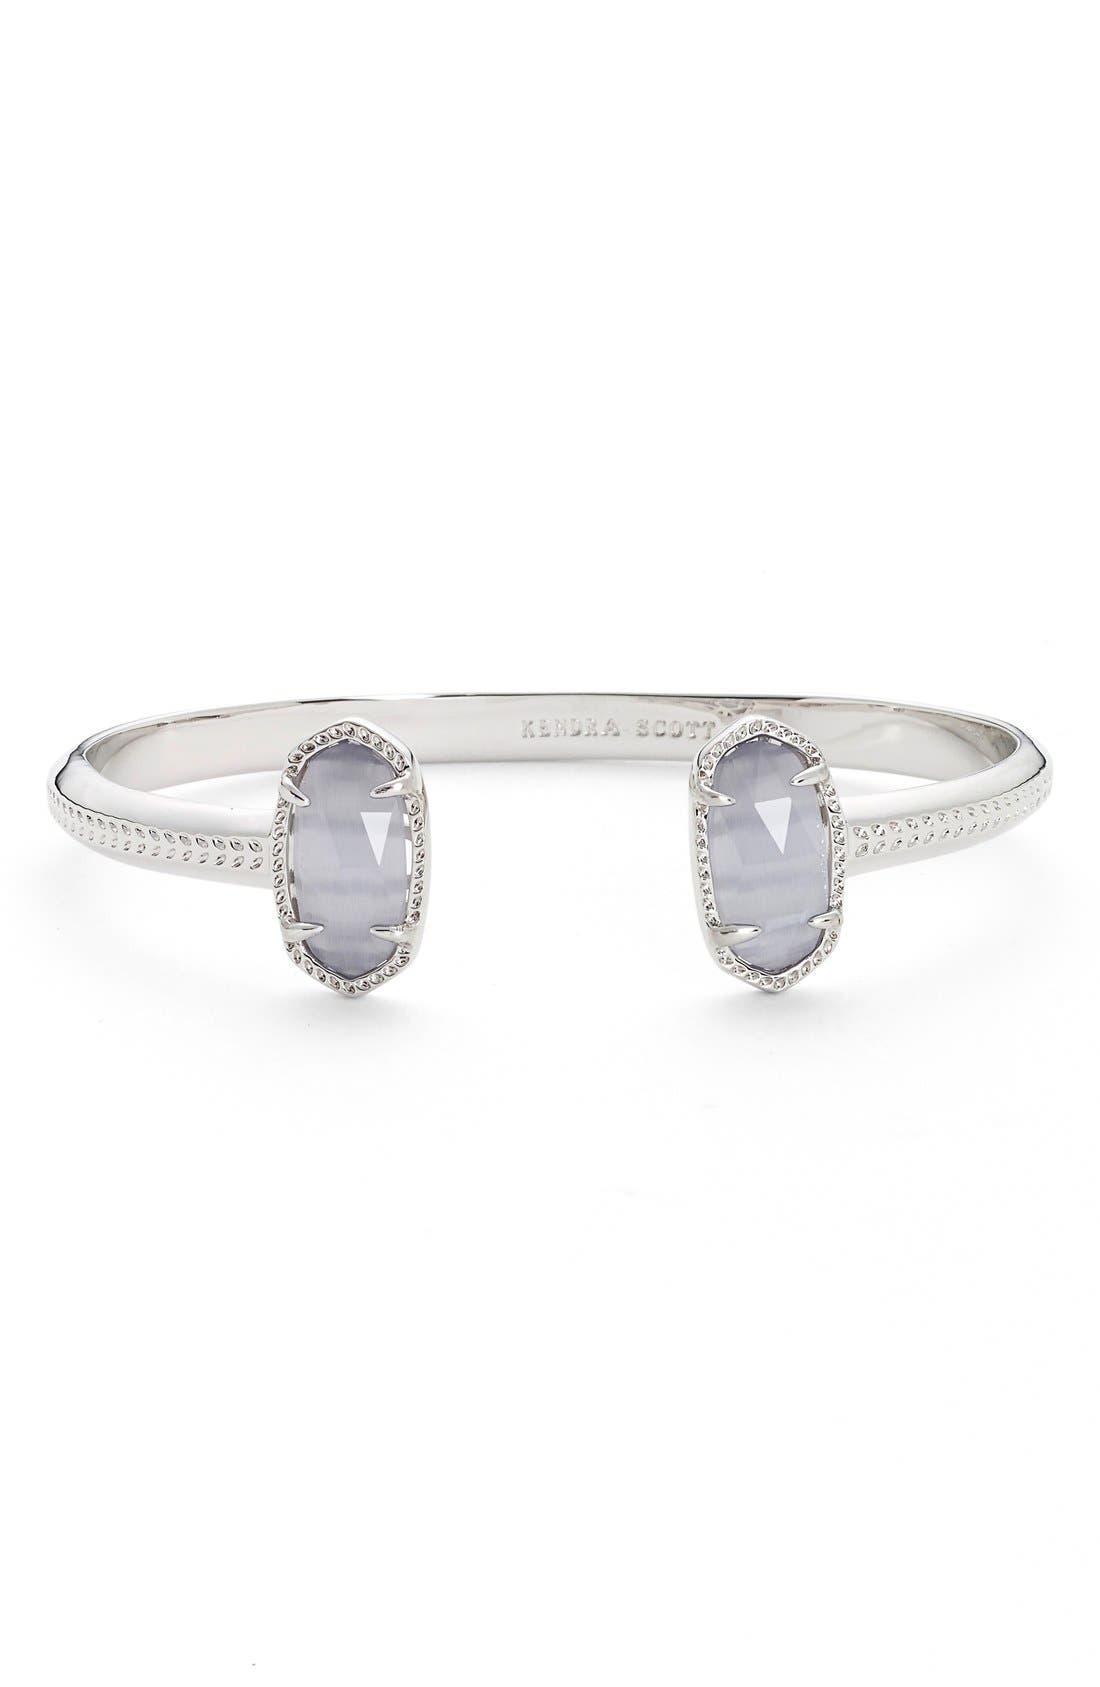 Main Image - Kendra Scott 'Elton' Station Cuff Bracelet